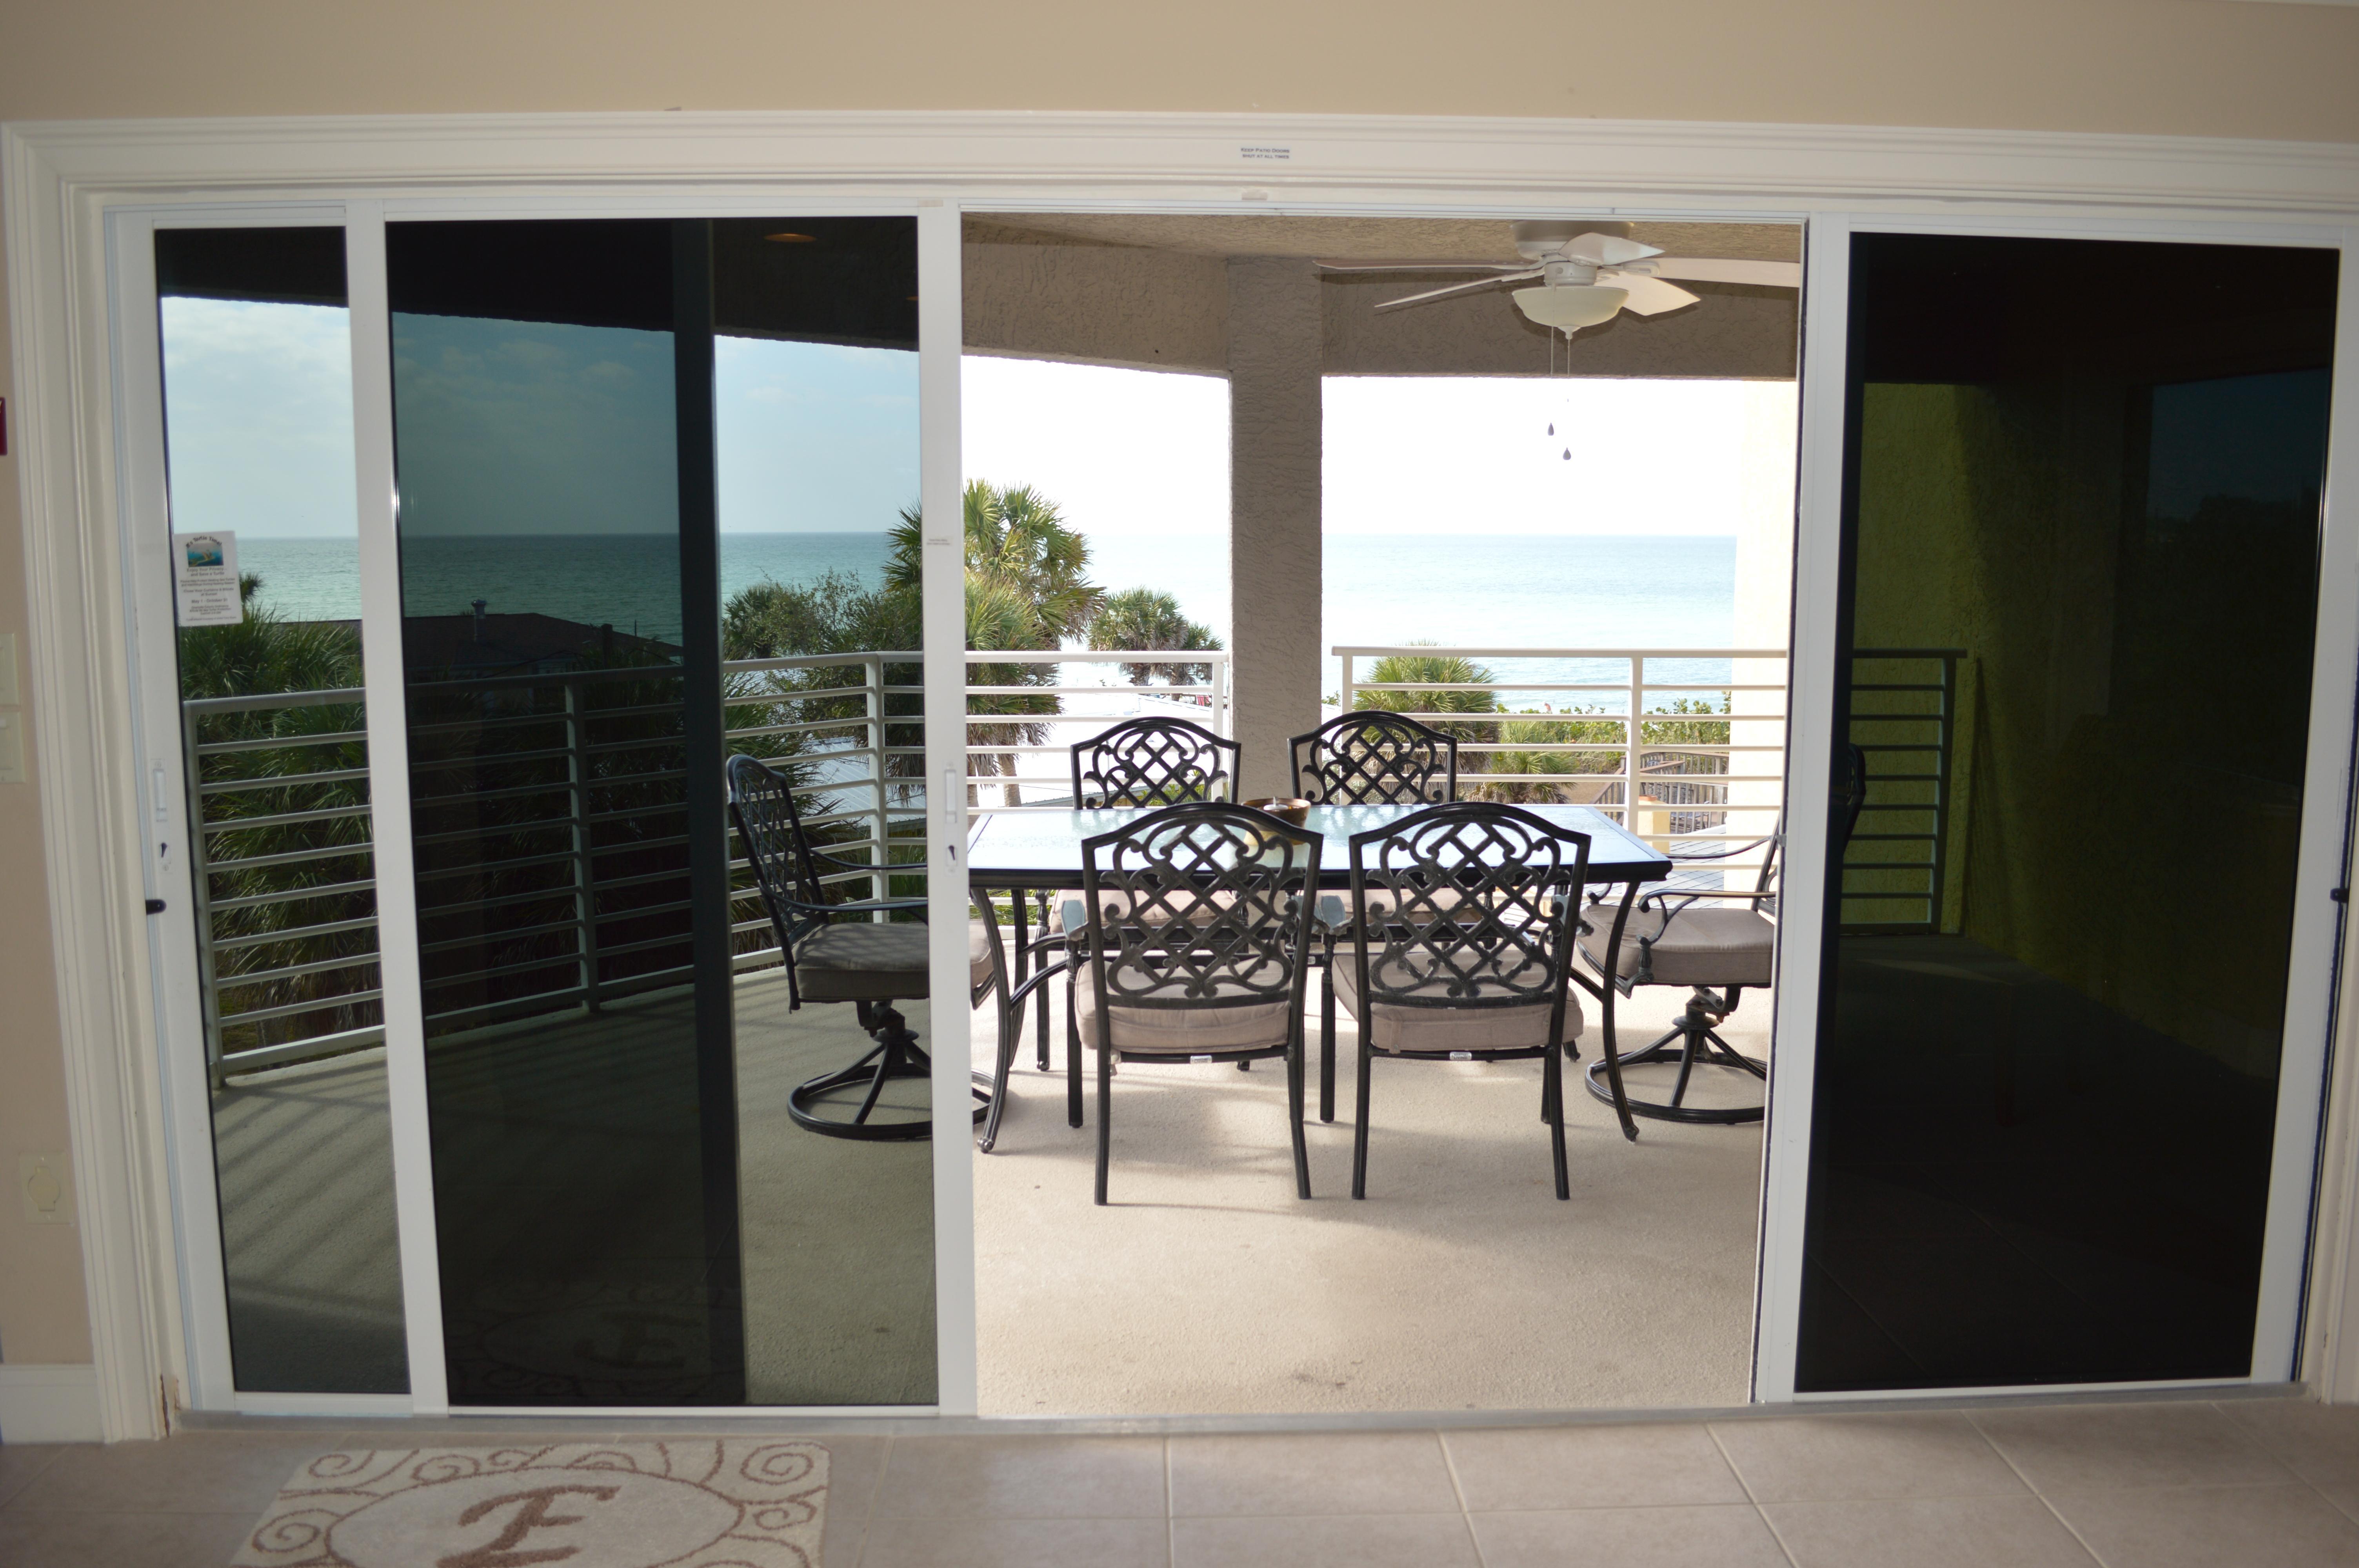 Englewood Beach Condo E | Englewood Beach Vacation Rentals